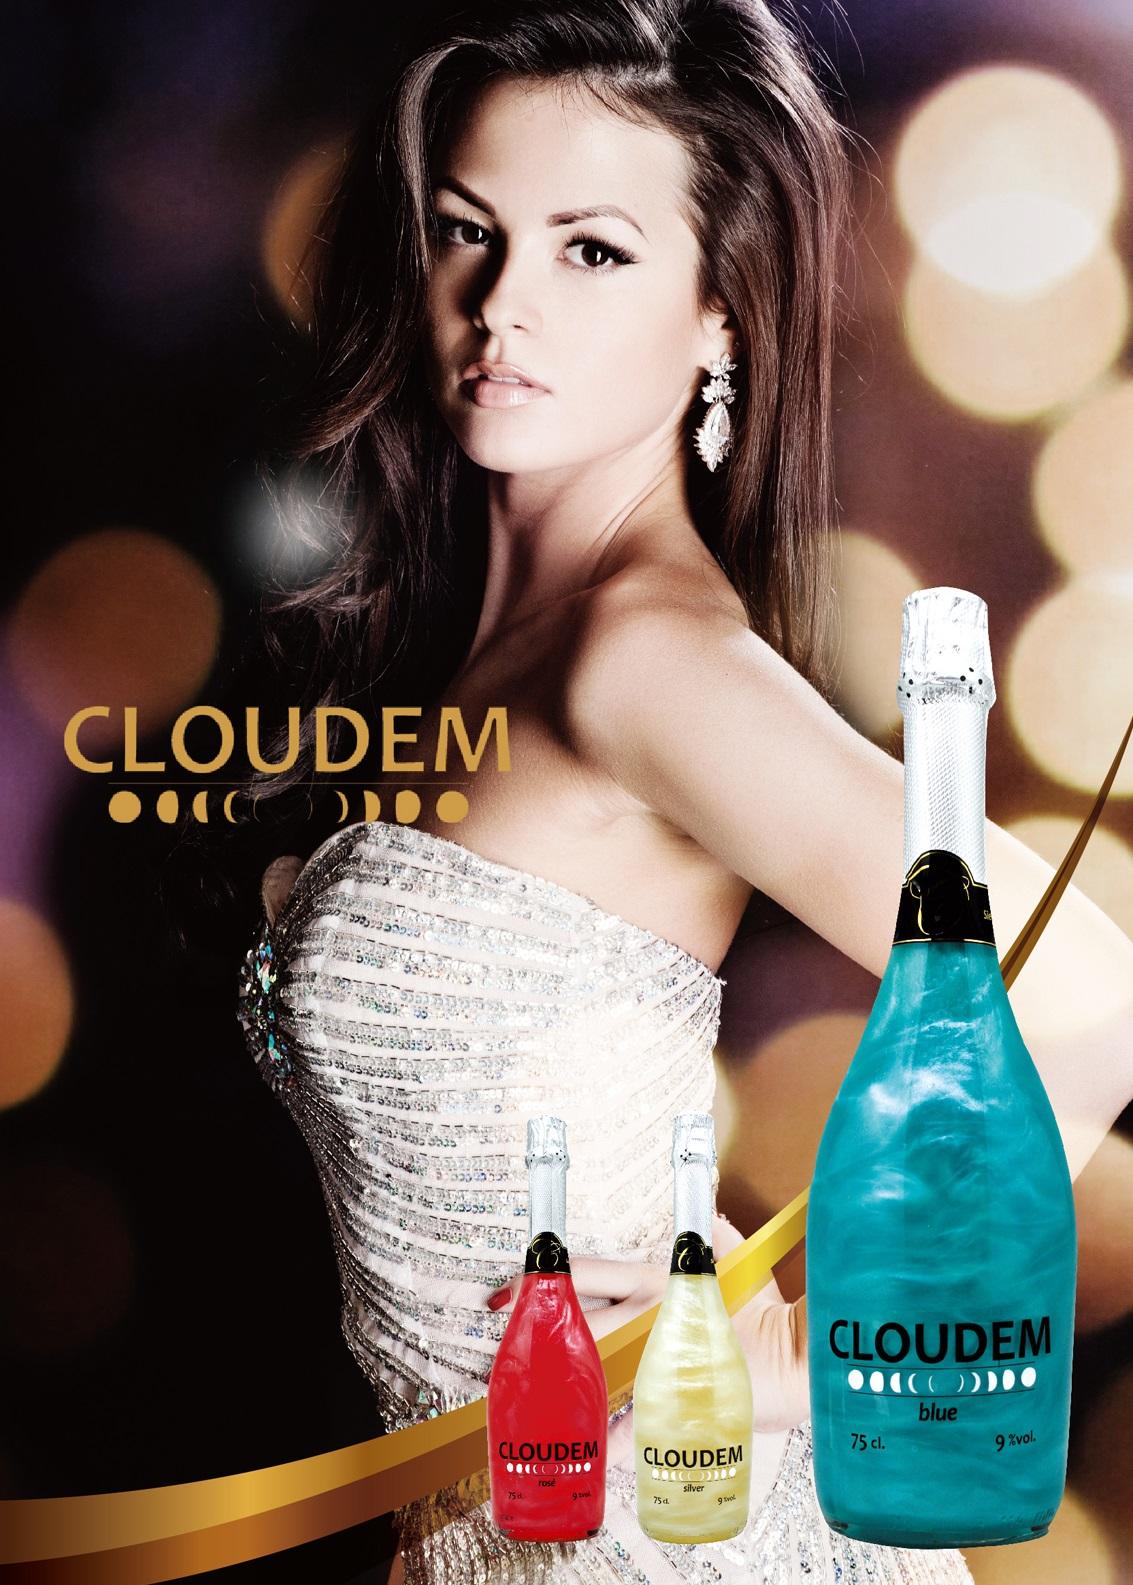 cloudem_image01.jpg